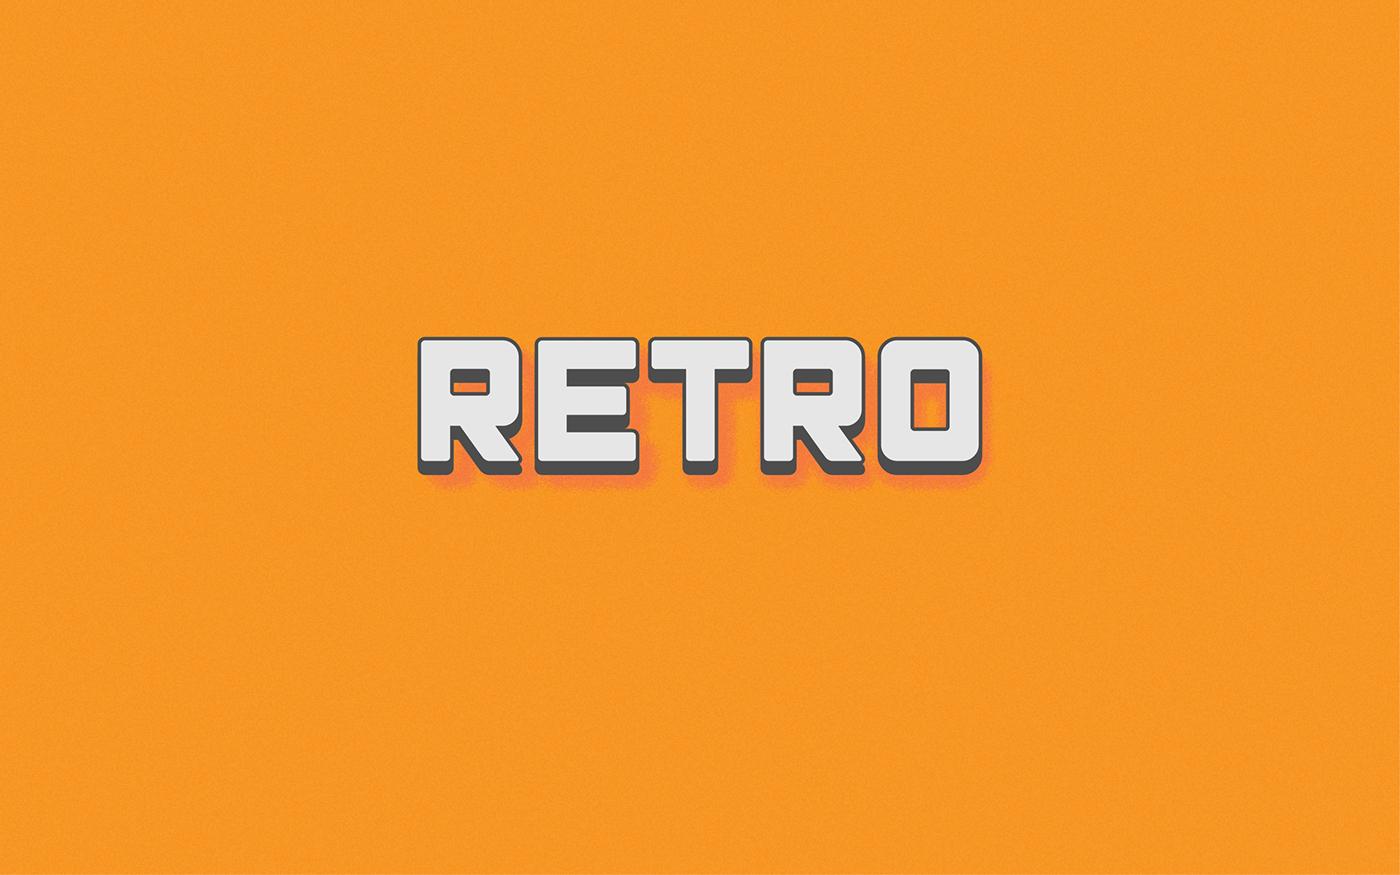 monk Display Typeface modern vintage Retro font Mono free freebie